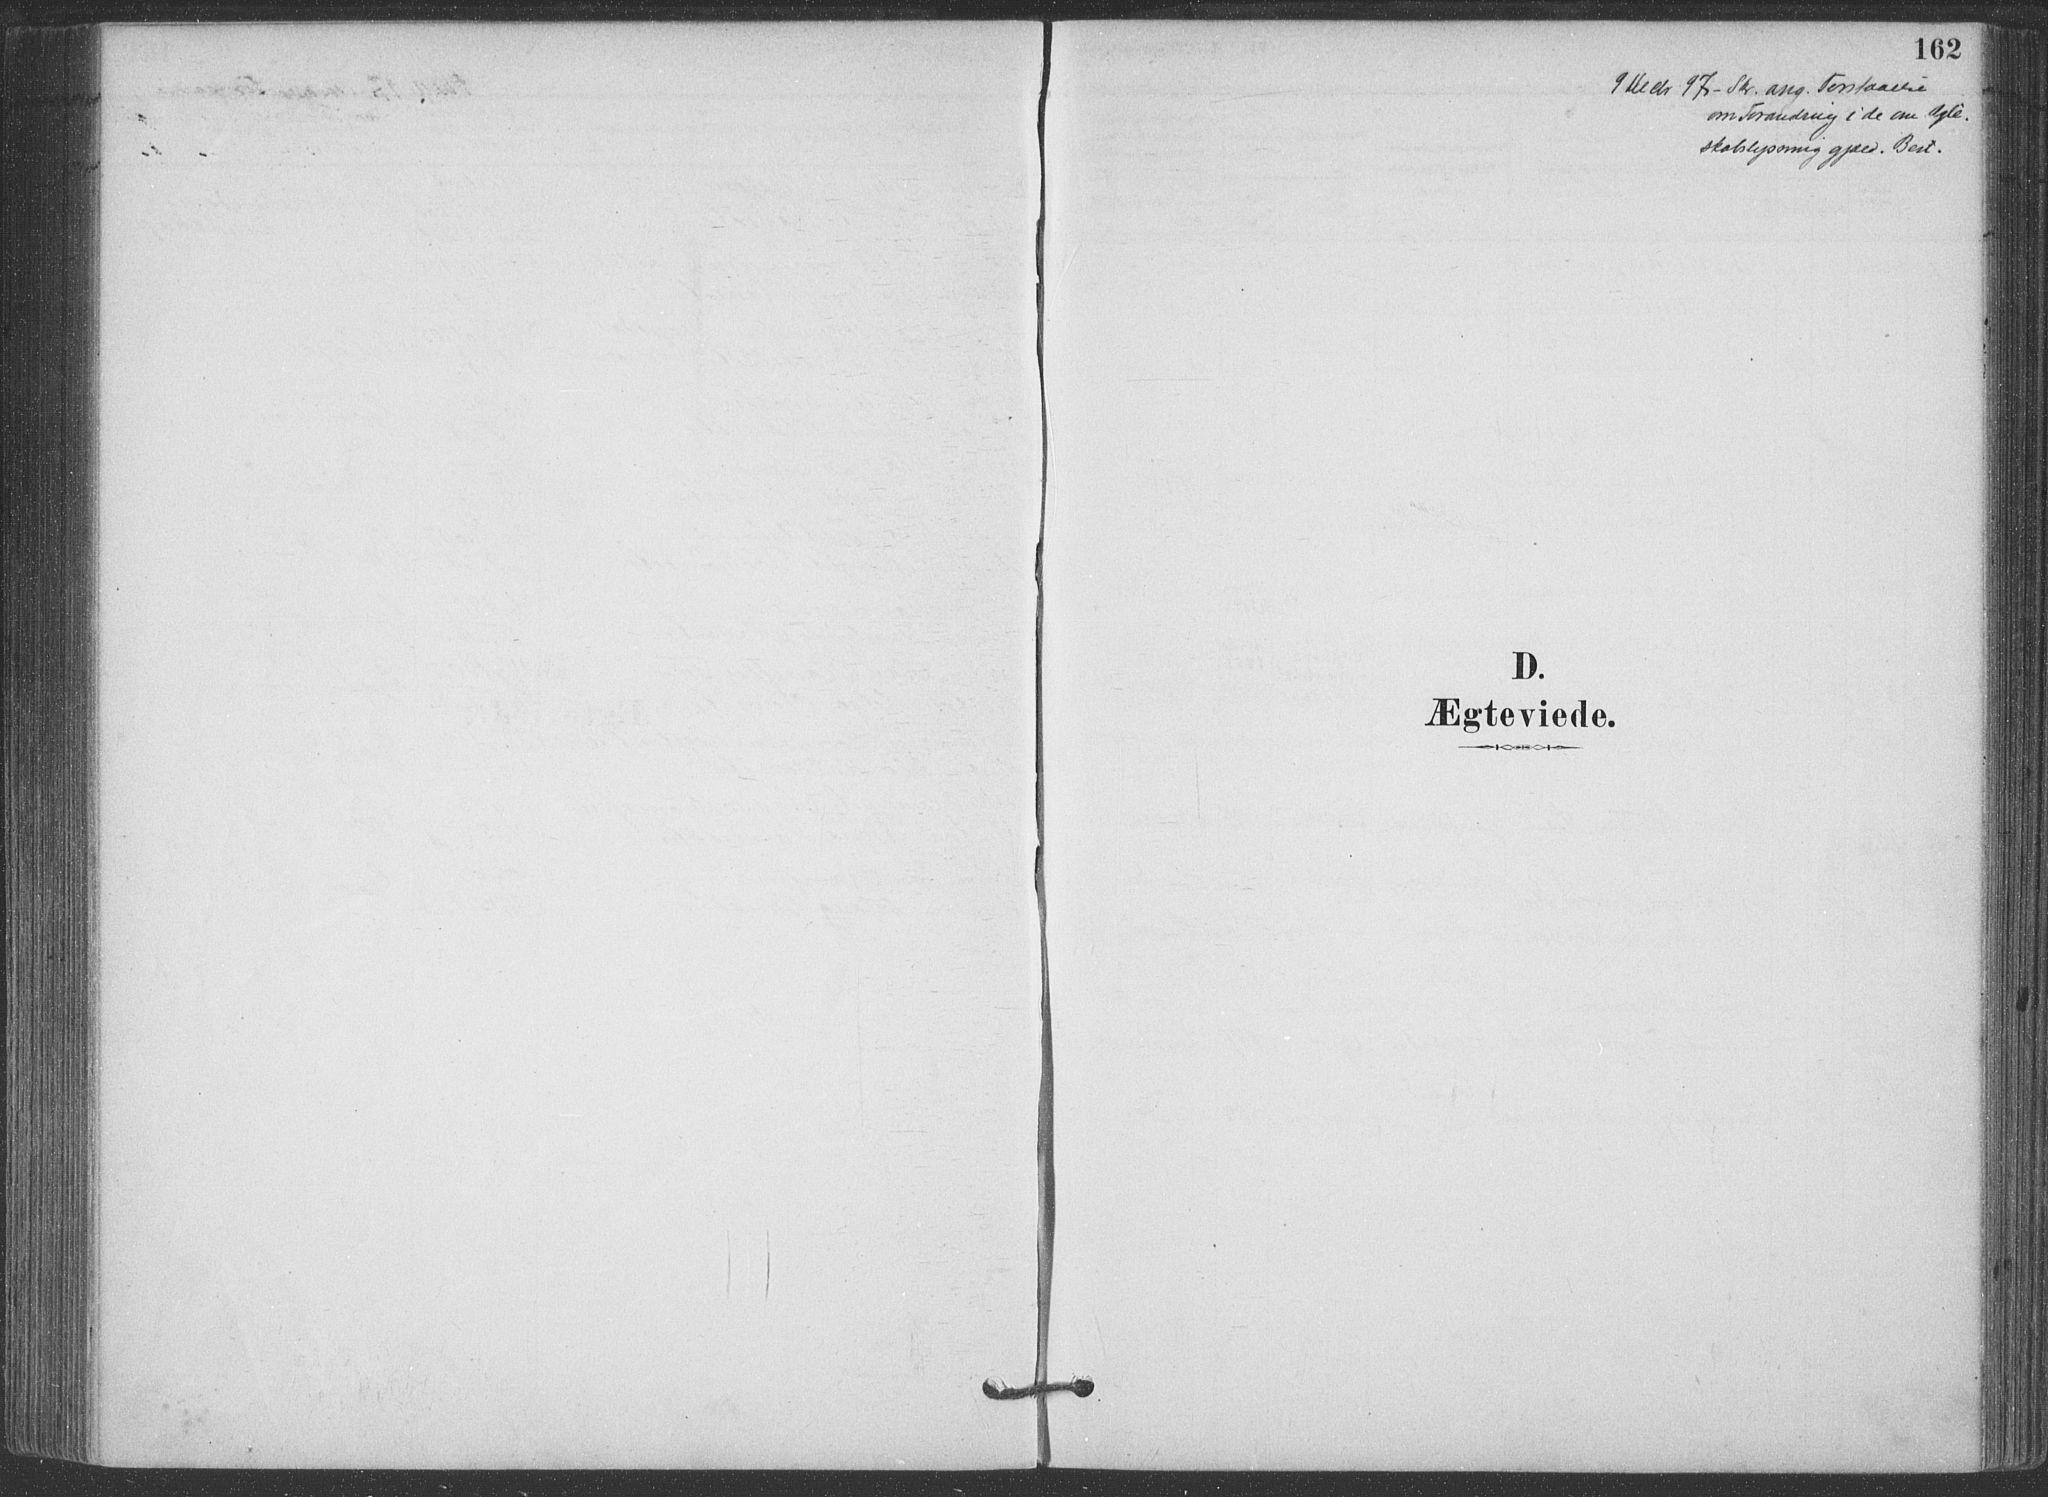 SAKO, Hjartdal kirkebøker, F/Fa/L0010: Ministerialbok nr. I 10, 1880-1929, s. 162